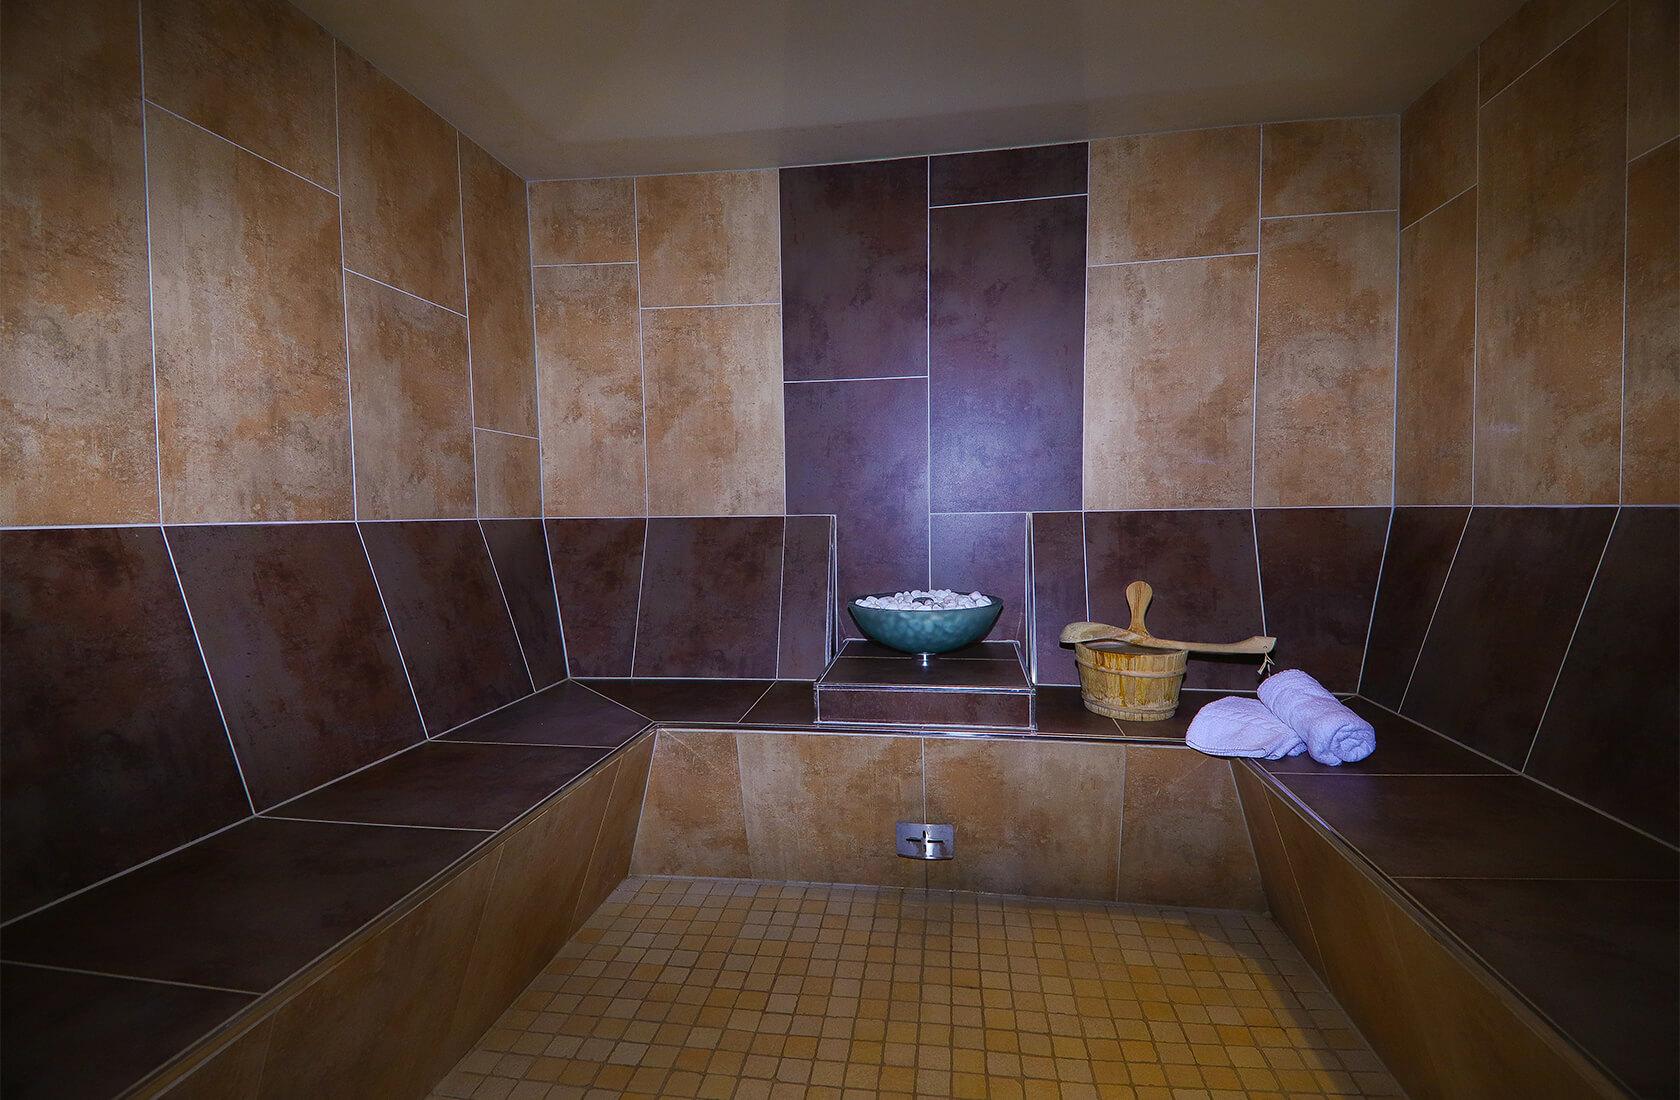 saunalandschaft im tirol urlaub beim hotel via salina. Black Bedroom Furniture Sets. Home Design Ideas